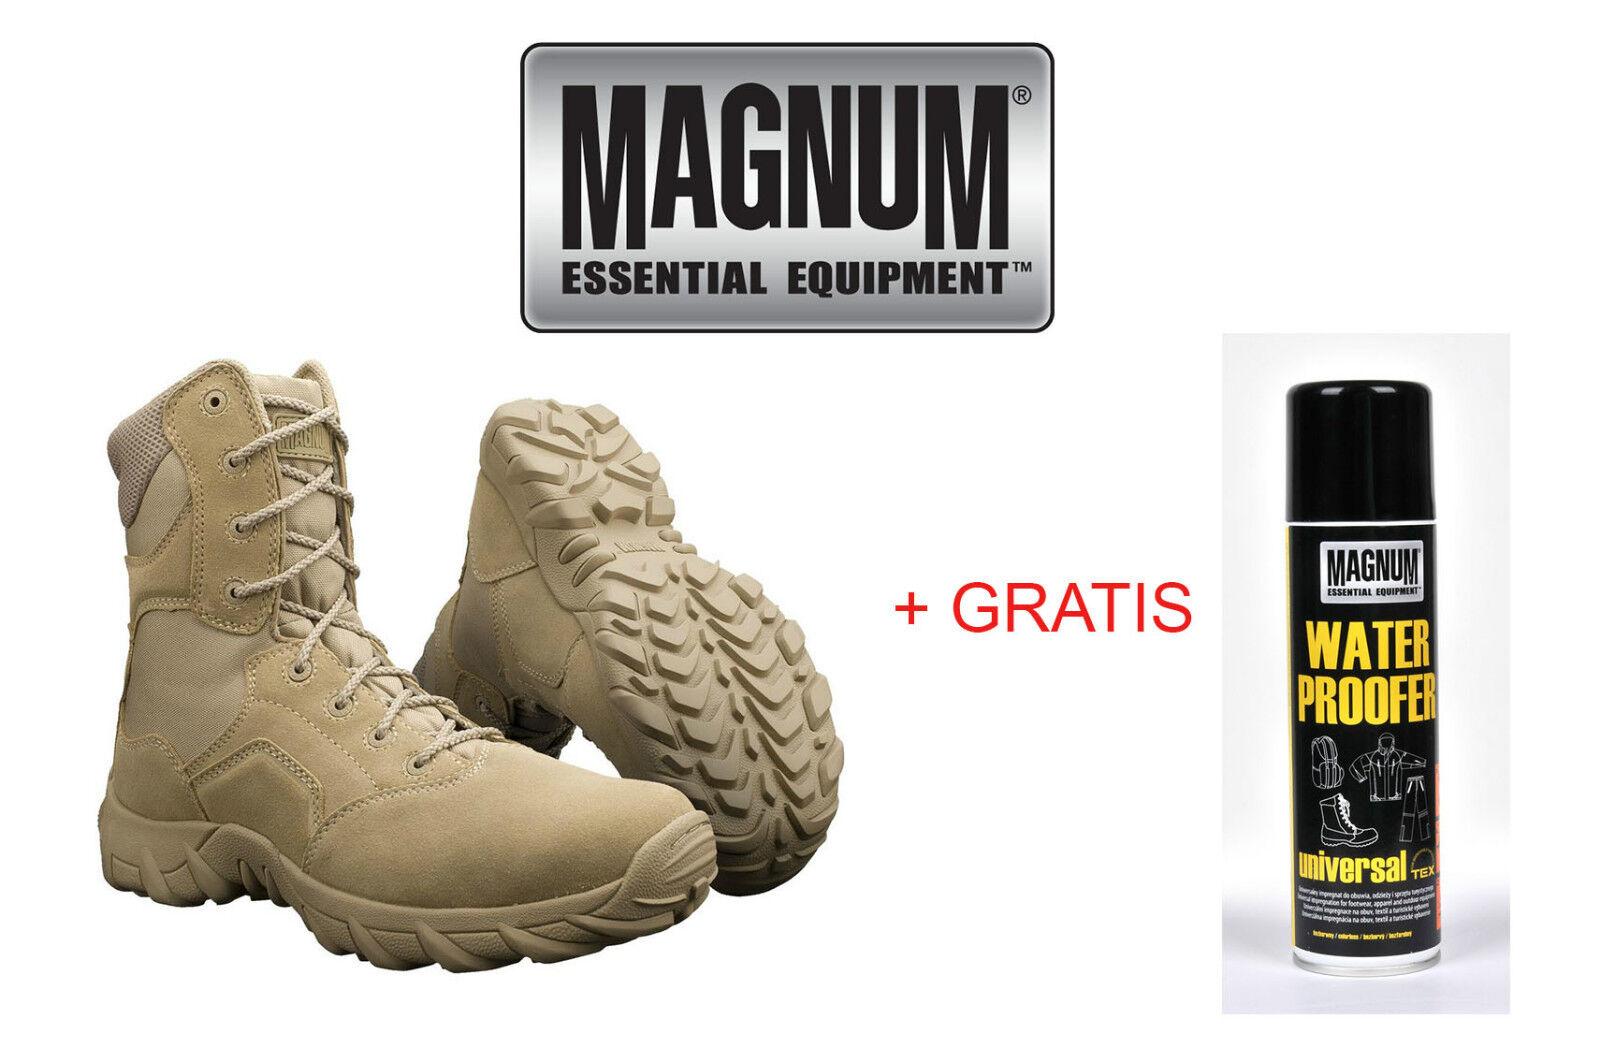 MAGNUM Hi-Tec Cobra 8.0 Desert Stiefel Boots Army Schuhe Kampfstiefel Gr.36~48